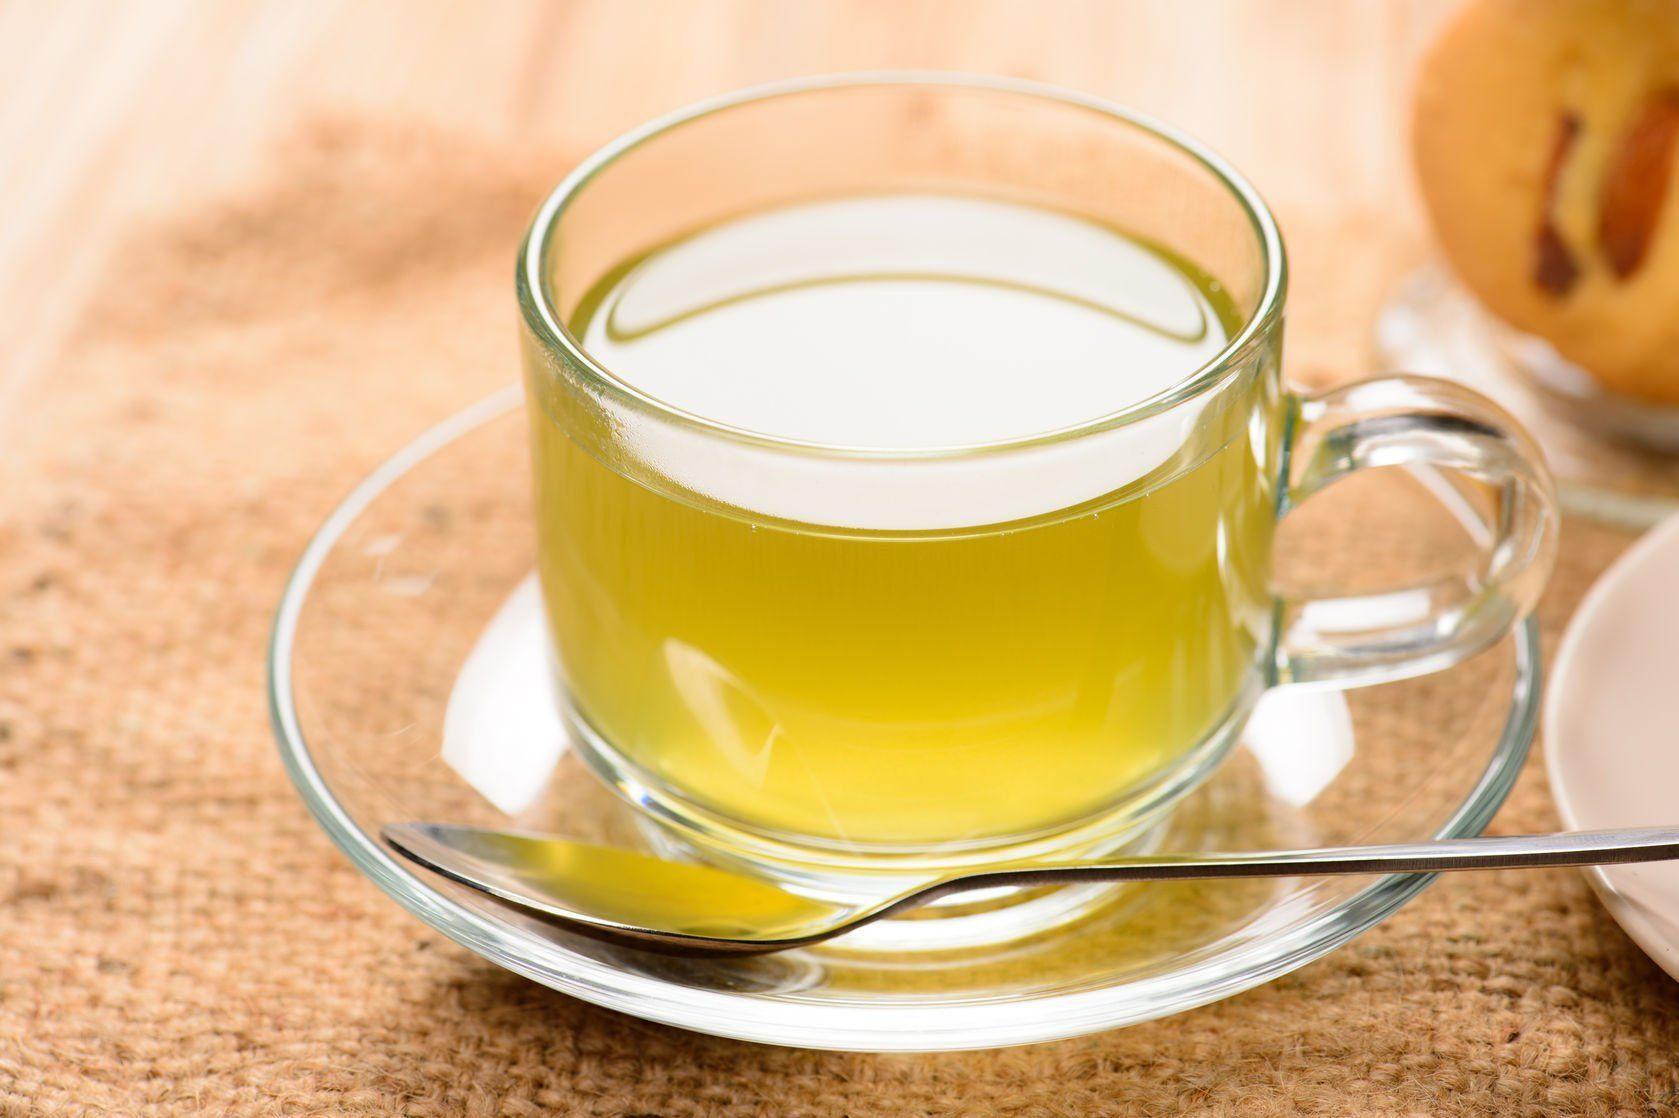 Minty Green Tea Chinese HighGrown Loose Leaf Green Tea